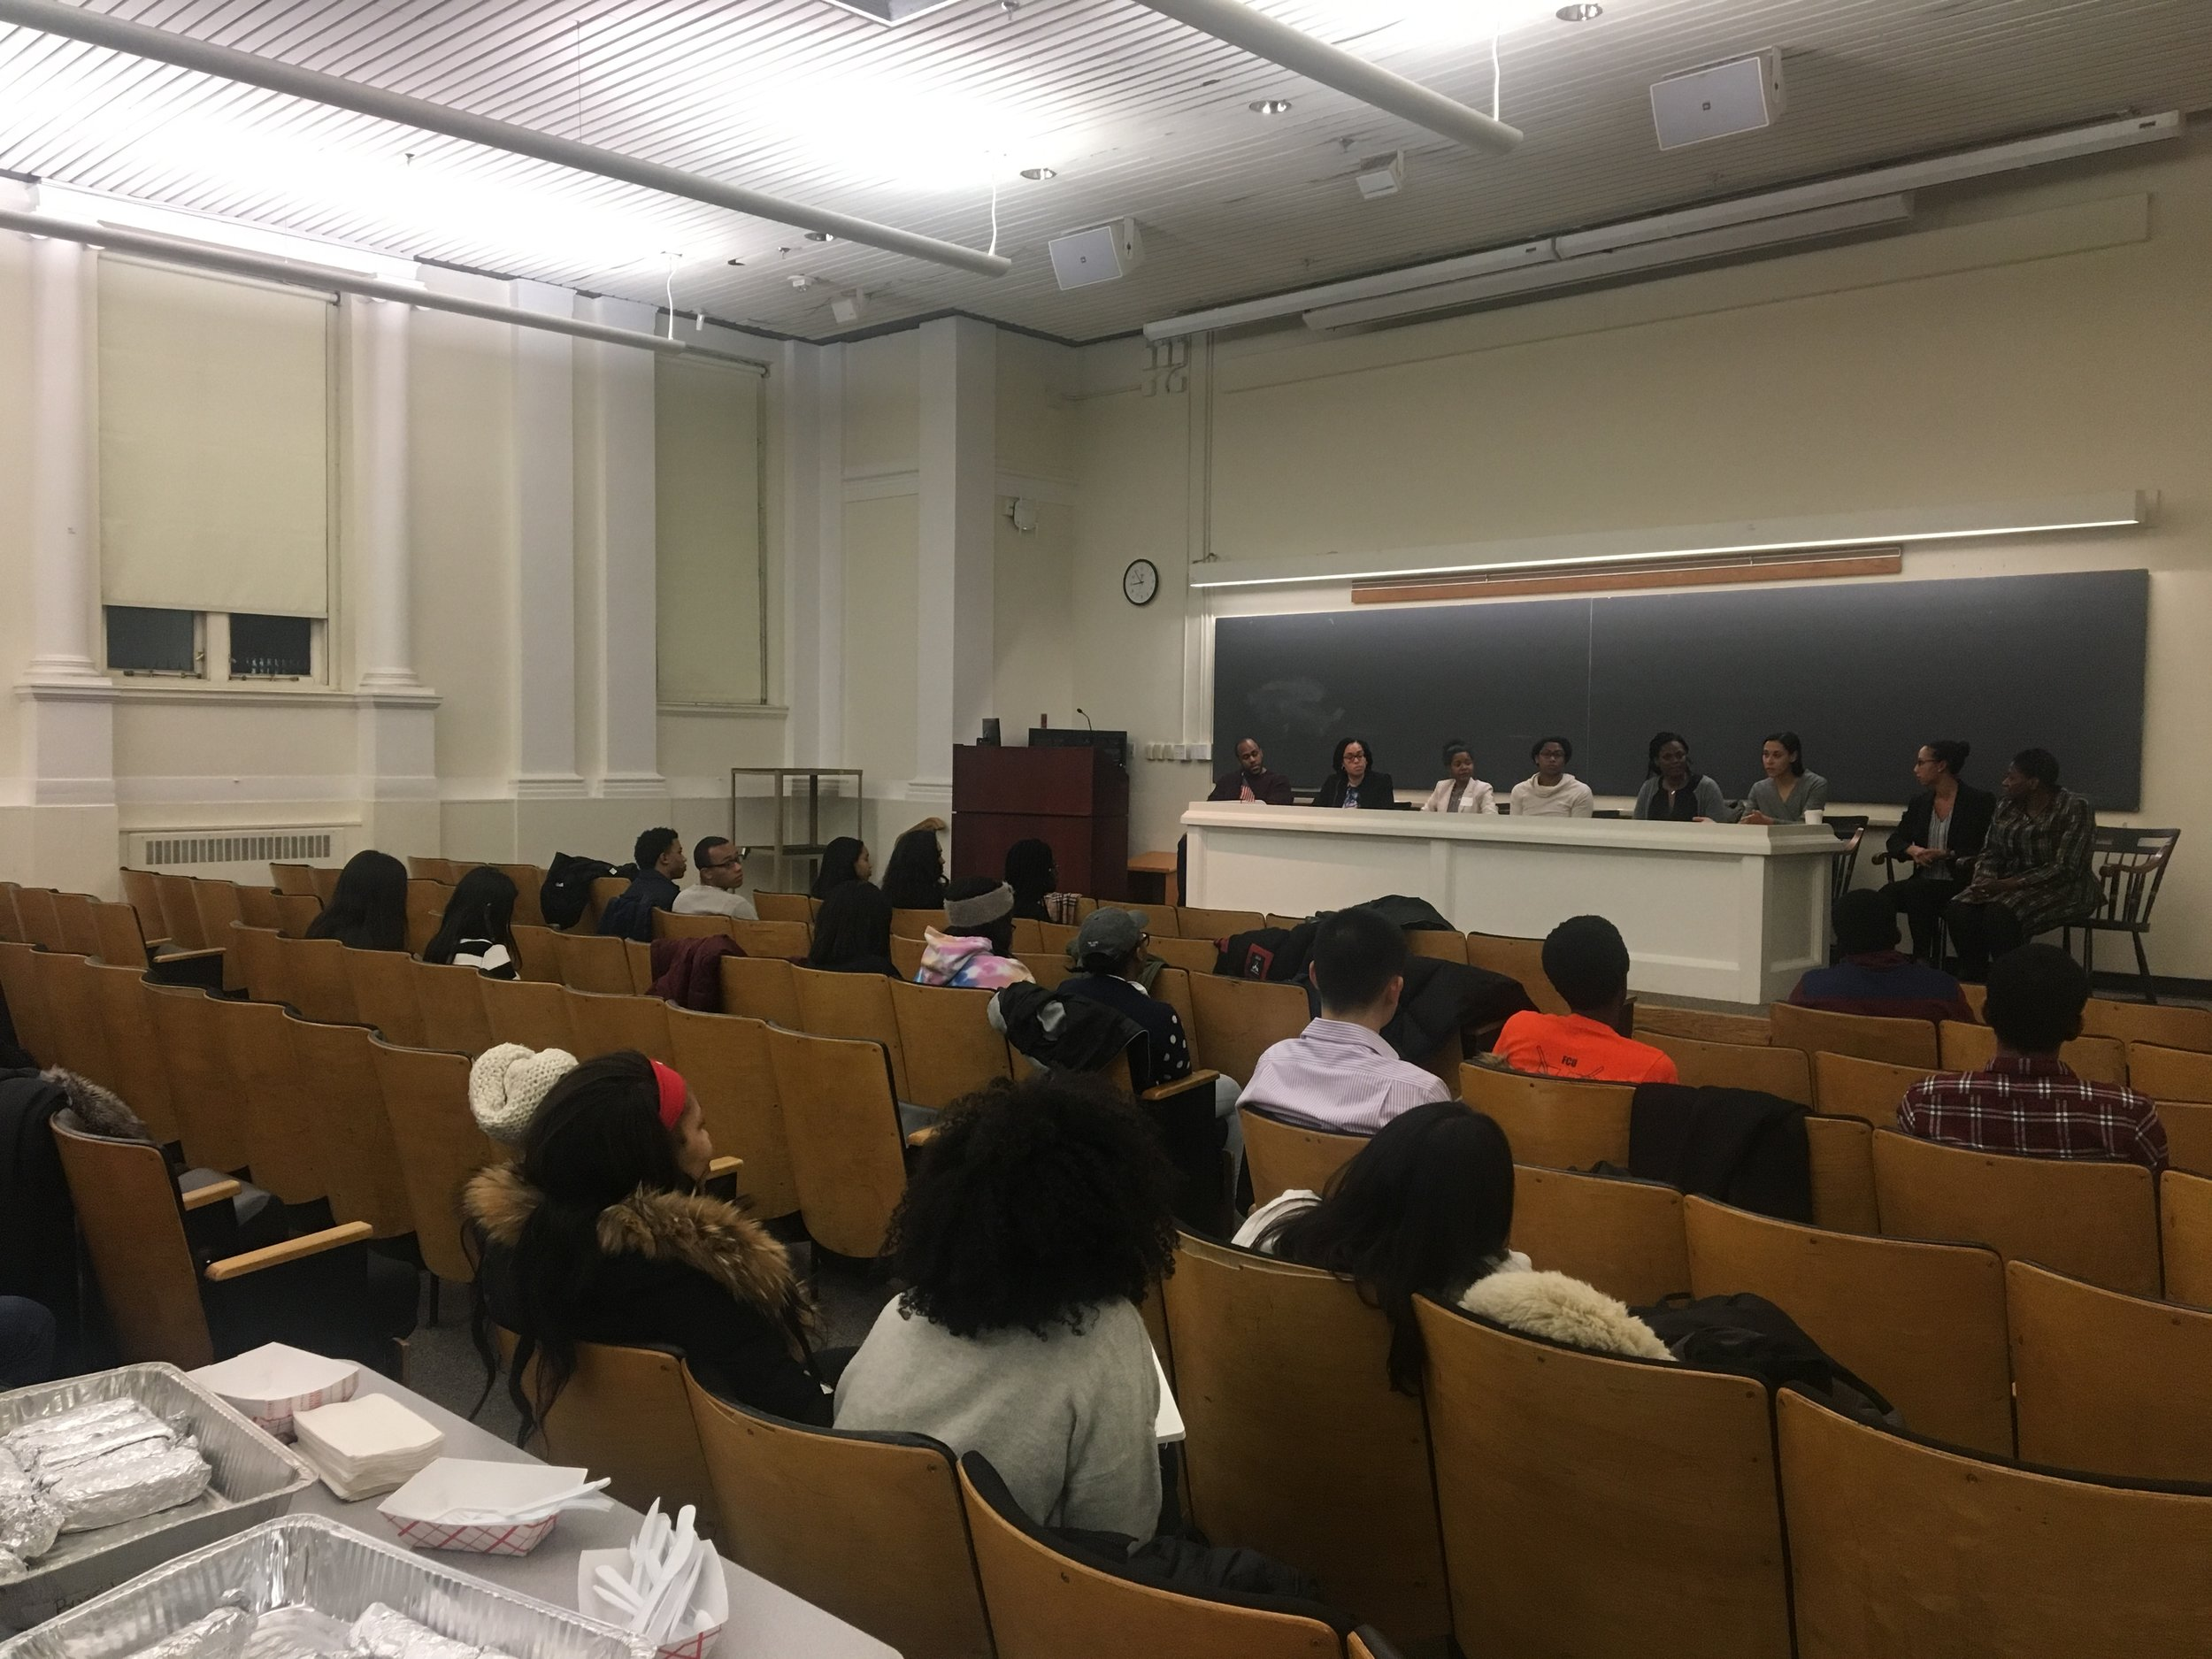 BPLA Corporate Law & Diversity Panel, 2019